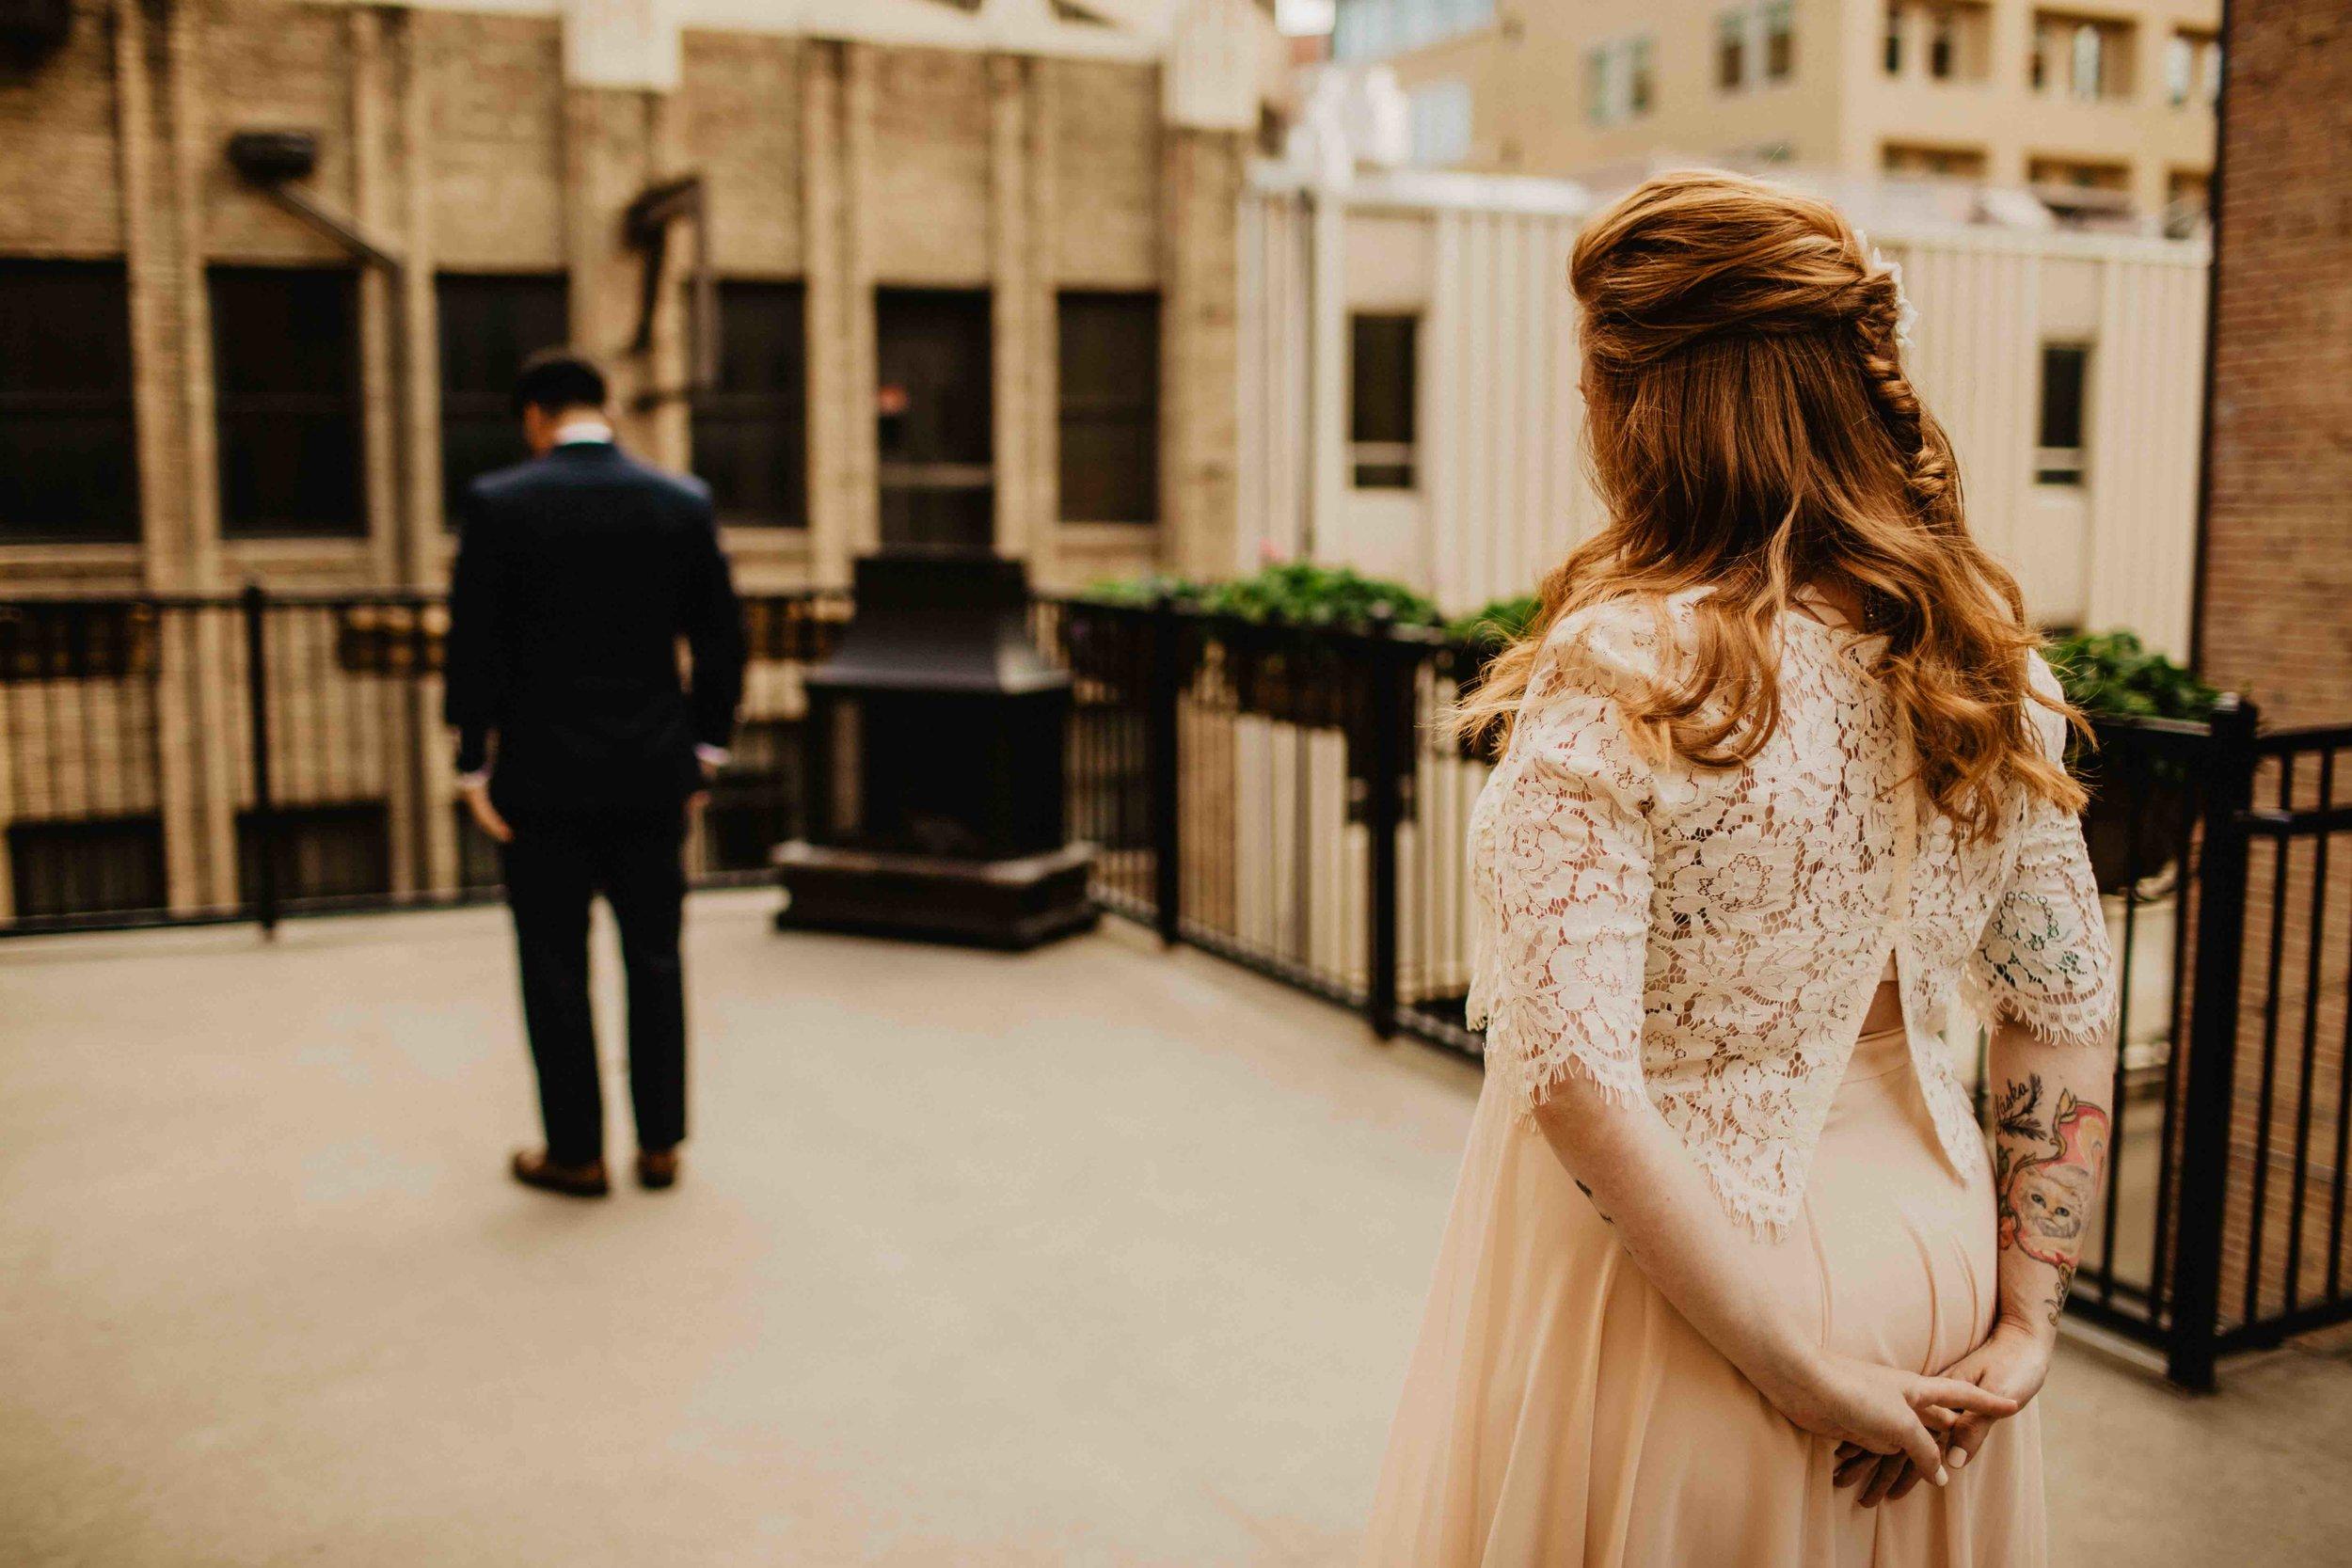 -colorado-wedding-photographer-denver-springs-vail-607A3659.jpeg